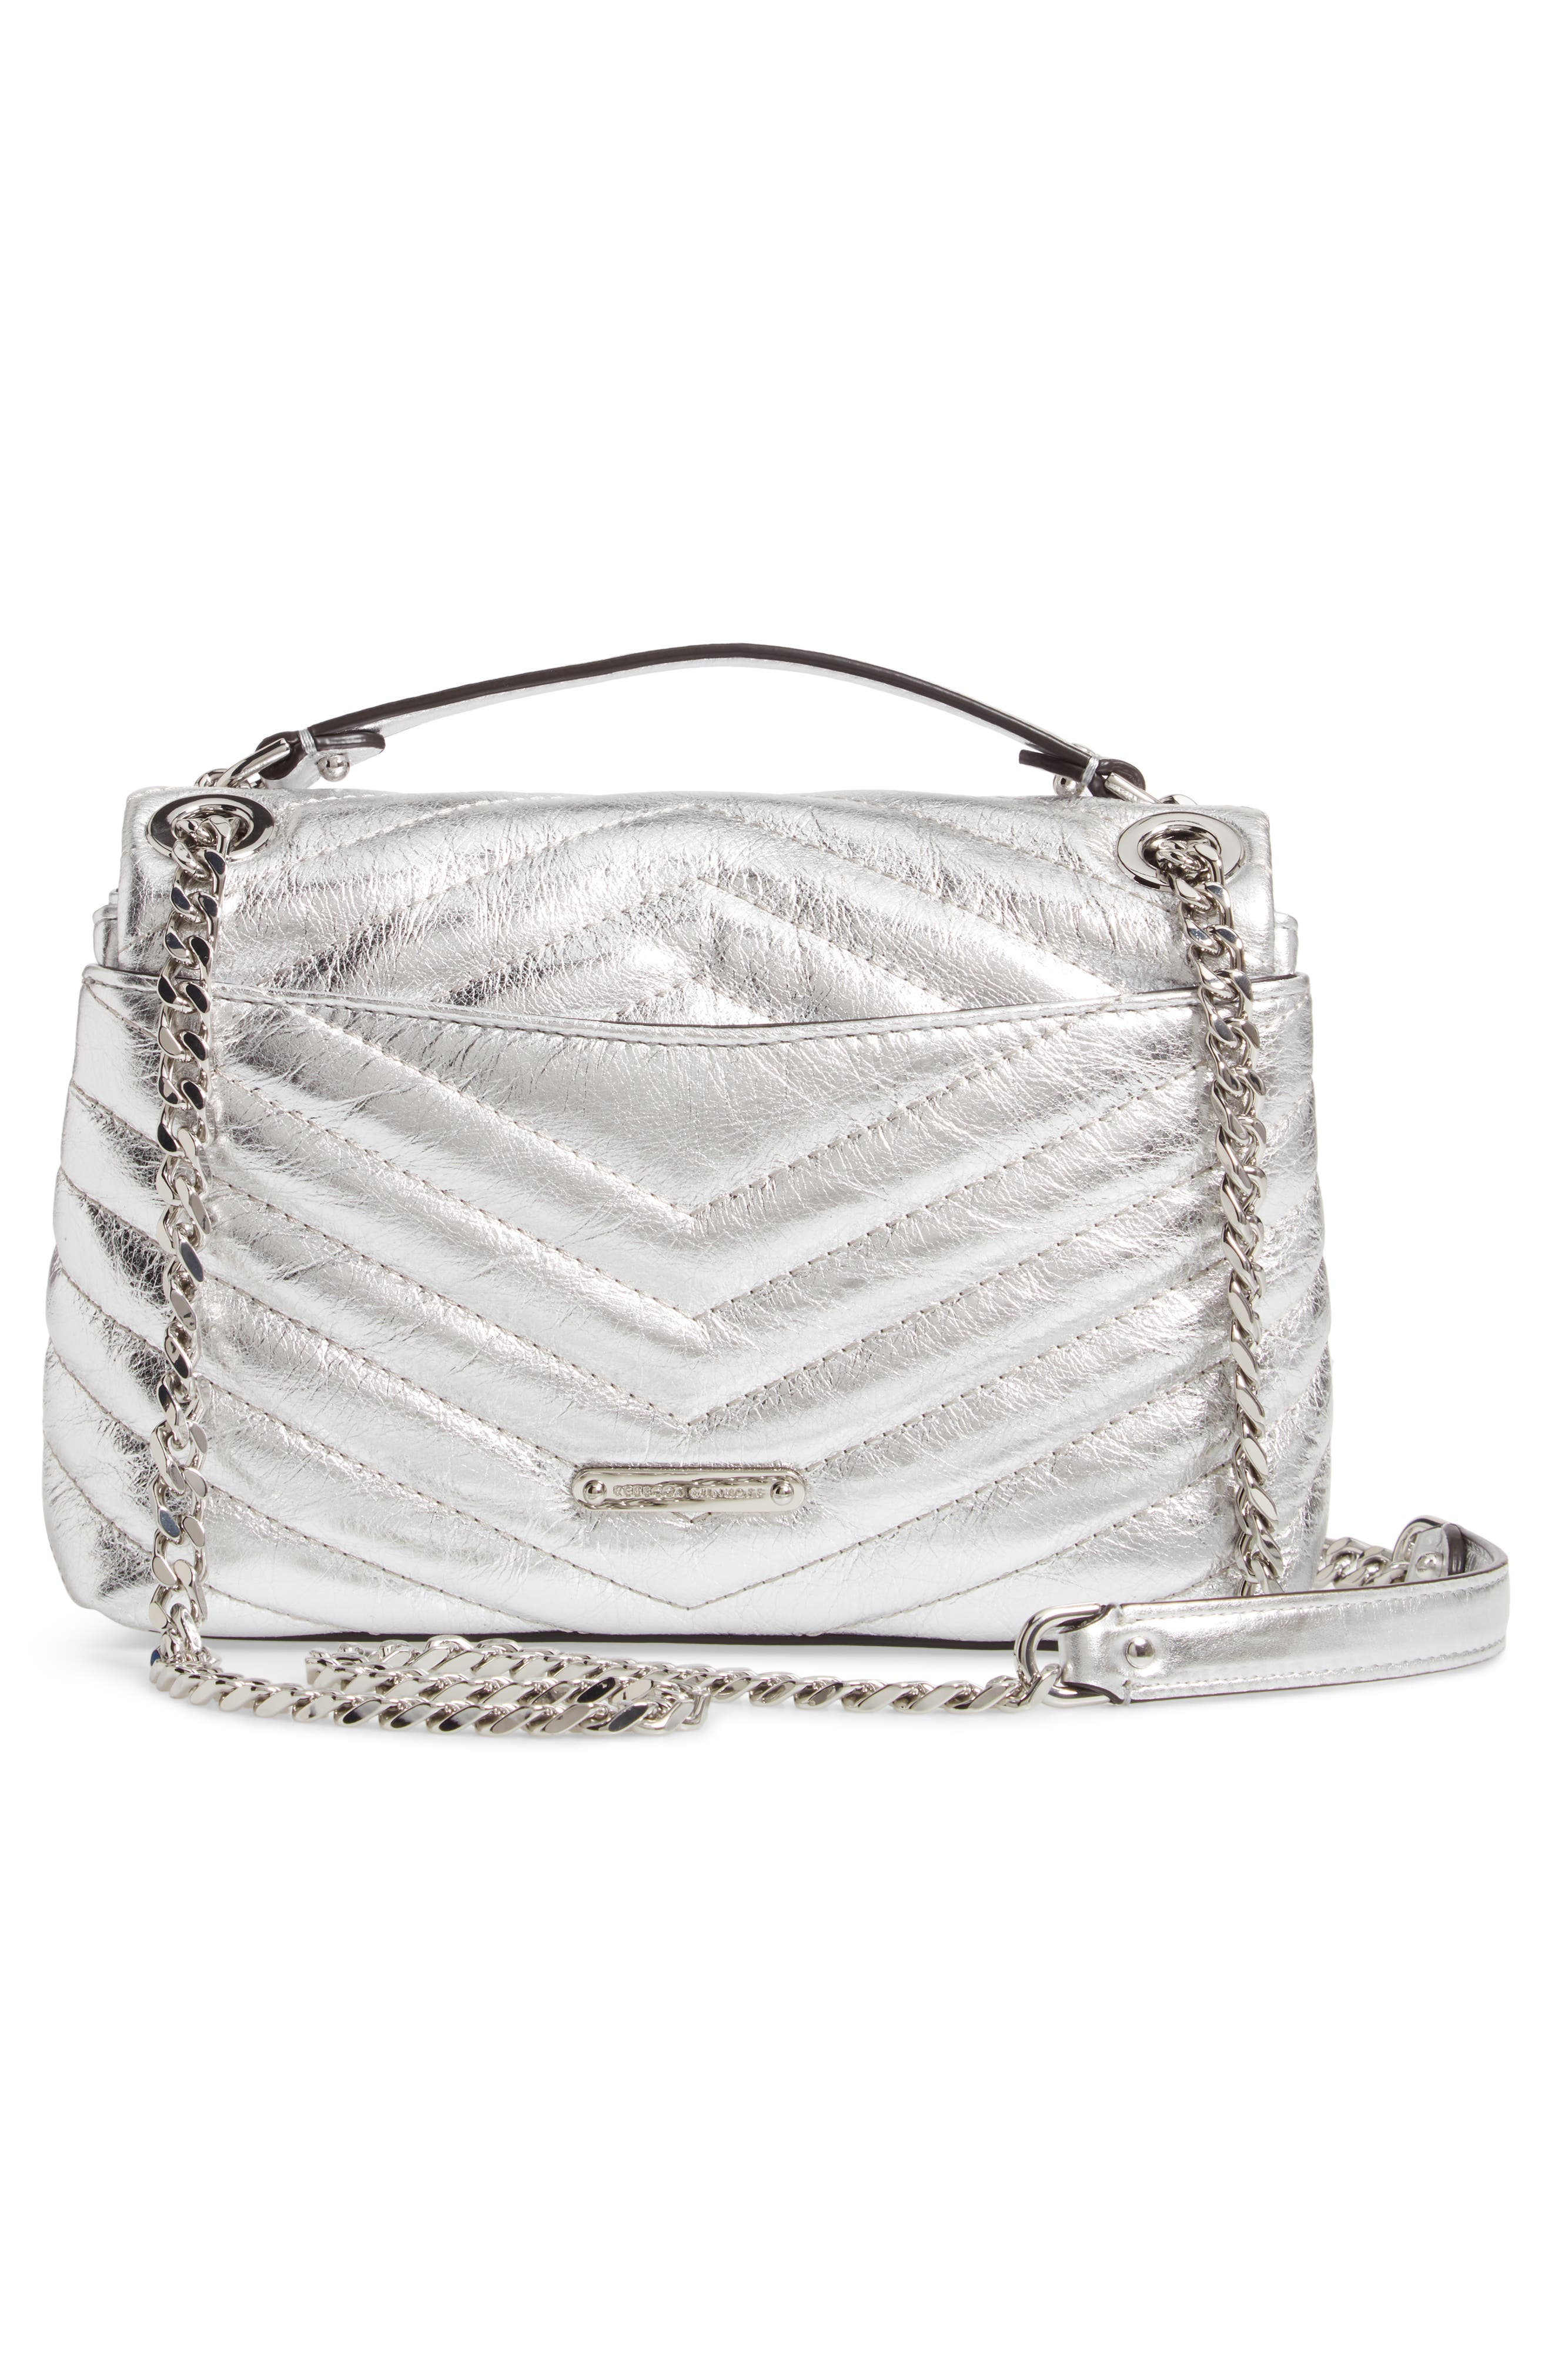 Edie Metallic Leather Shoulder Bag,                             Alternate thumbnail 3, color,                             SILVER